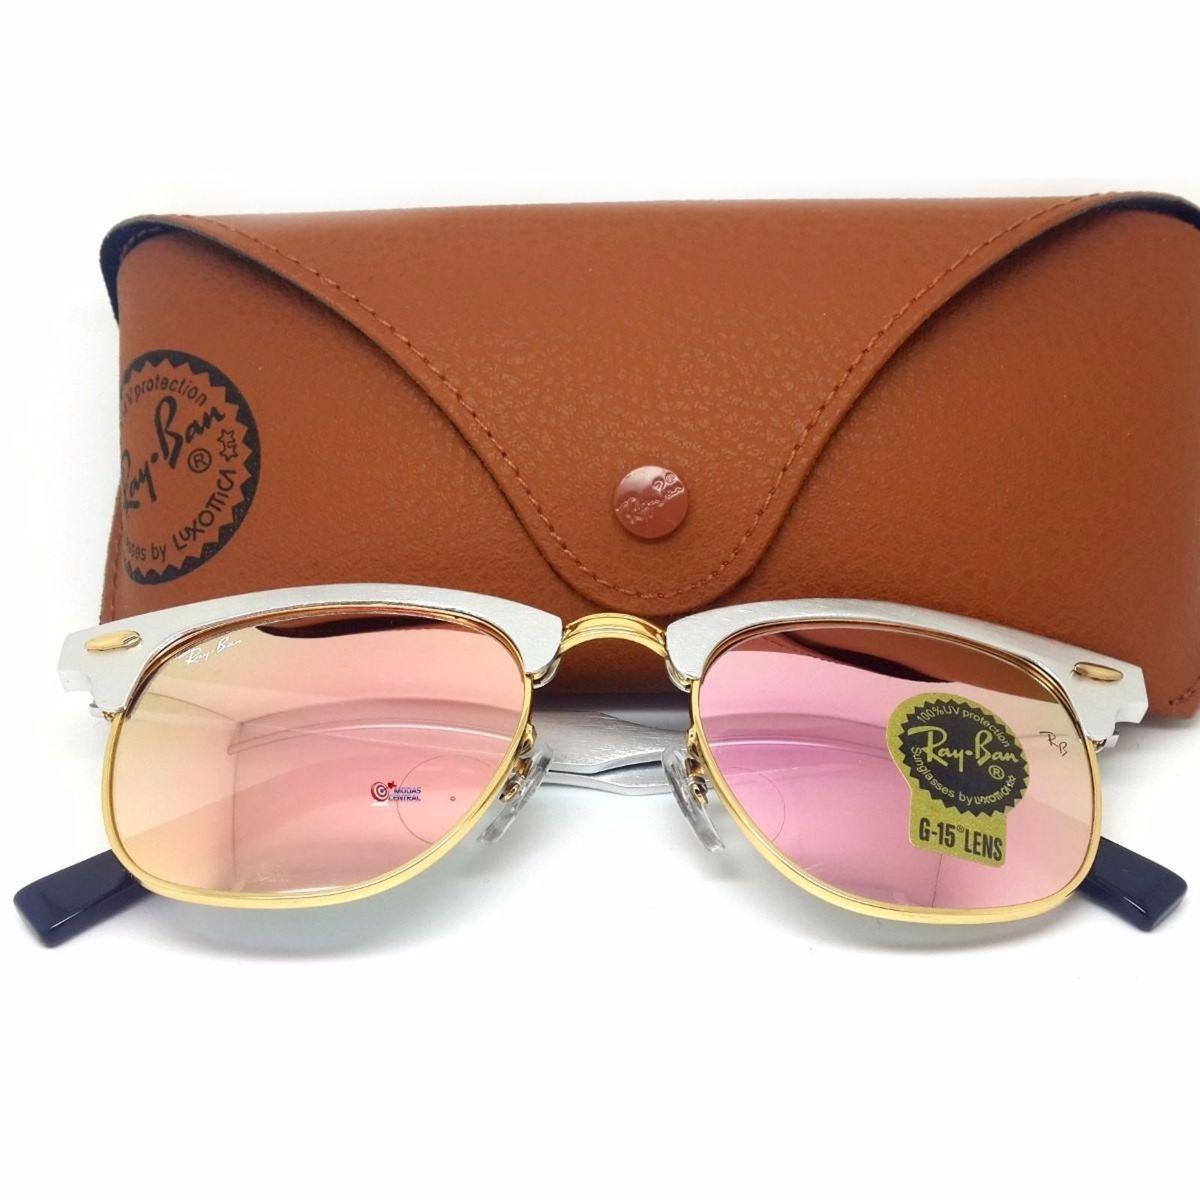 b6ad9b021 Clubmaster Aluminio Prata Rosa Espelhado | Óculos Feminino Ray Ban Nunca  Usado 14203784 | enjoei